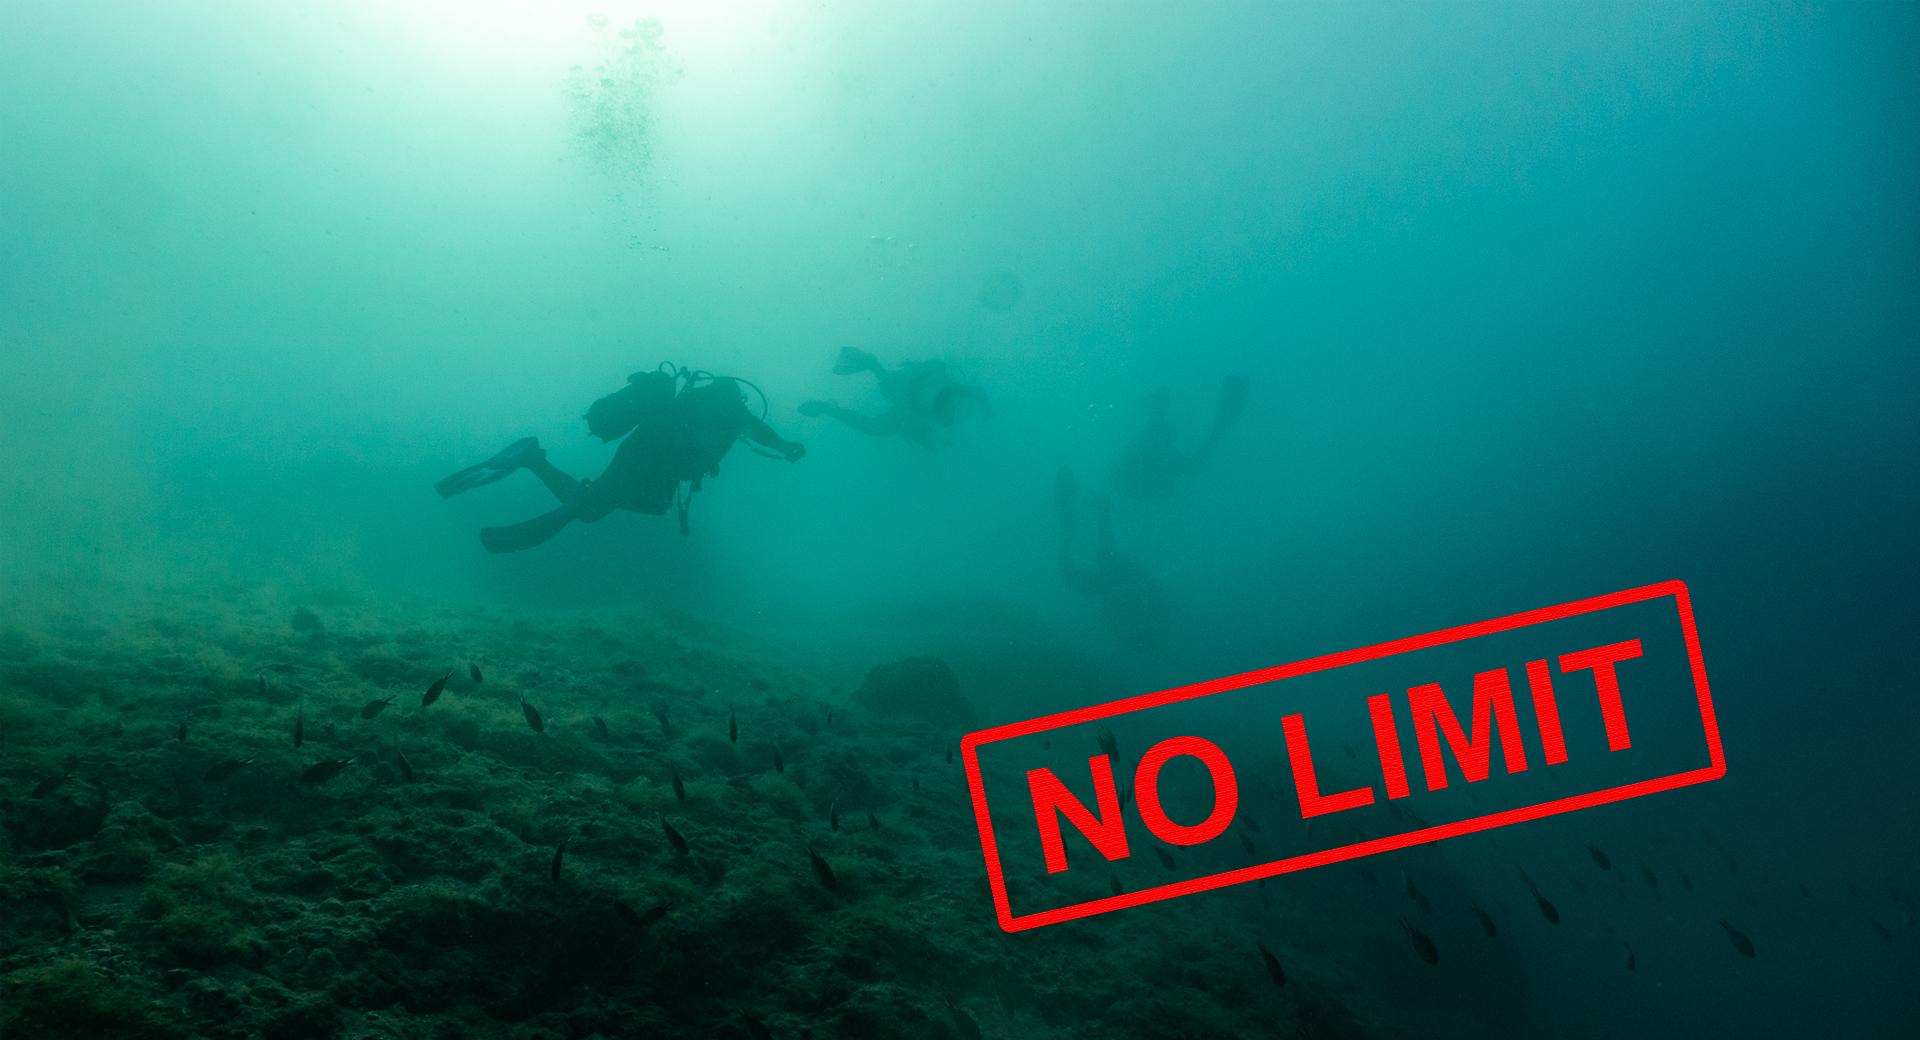 No Limit Diving!